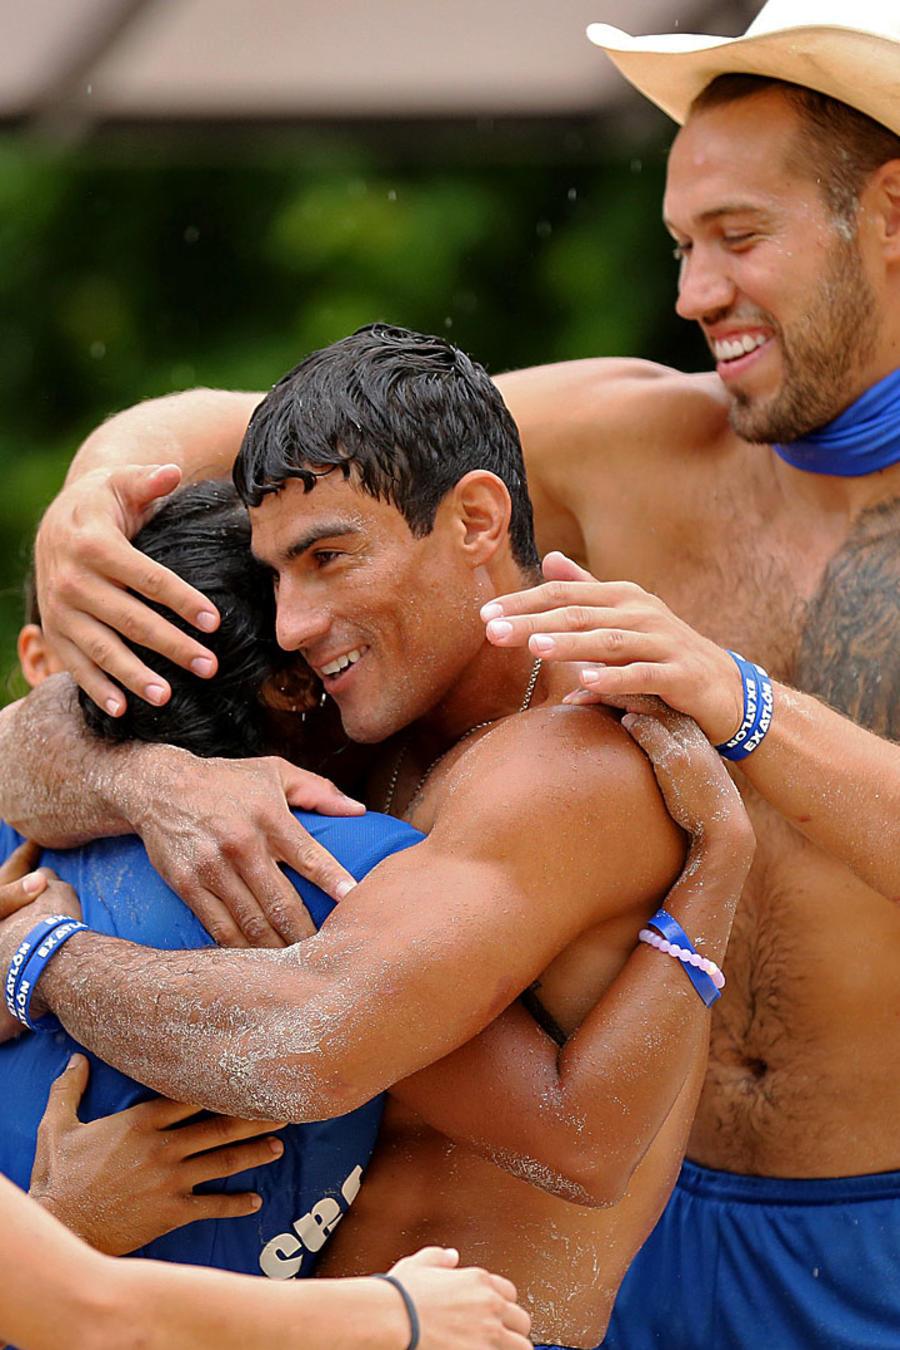 Contendientes se abrazan celebrando victoria